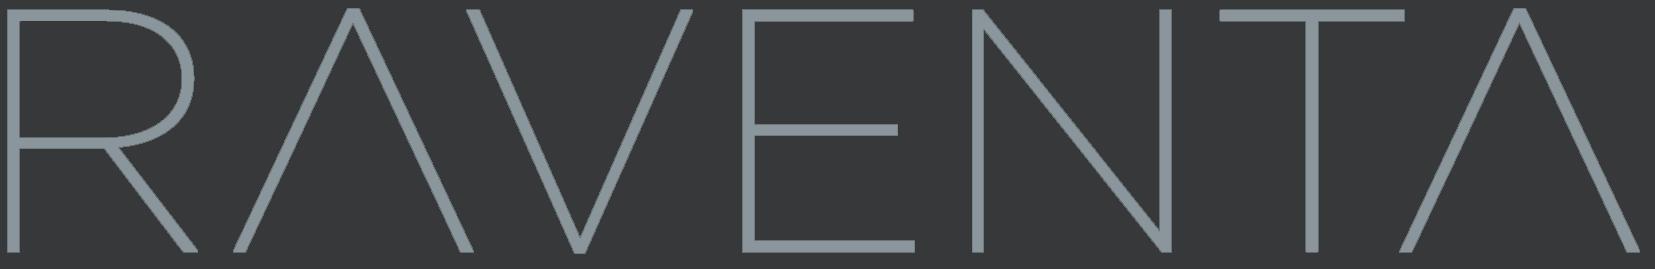 Raventa Logo